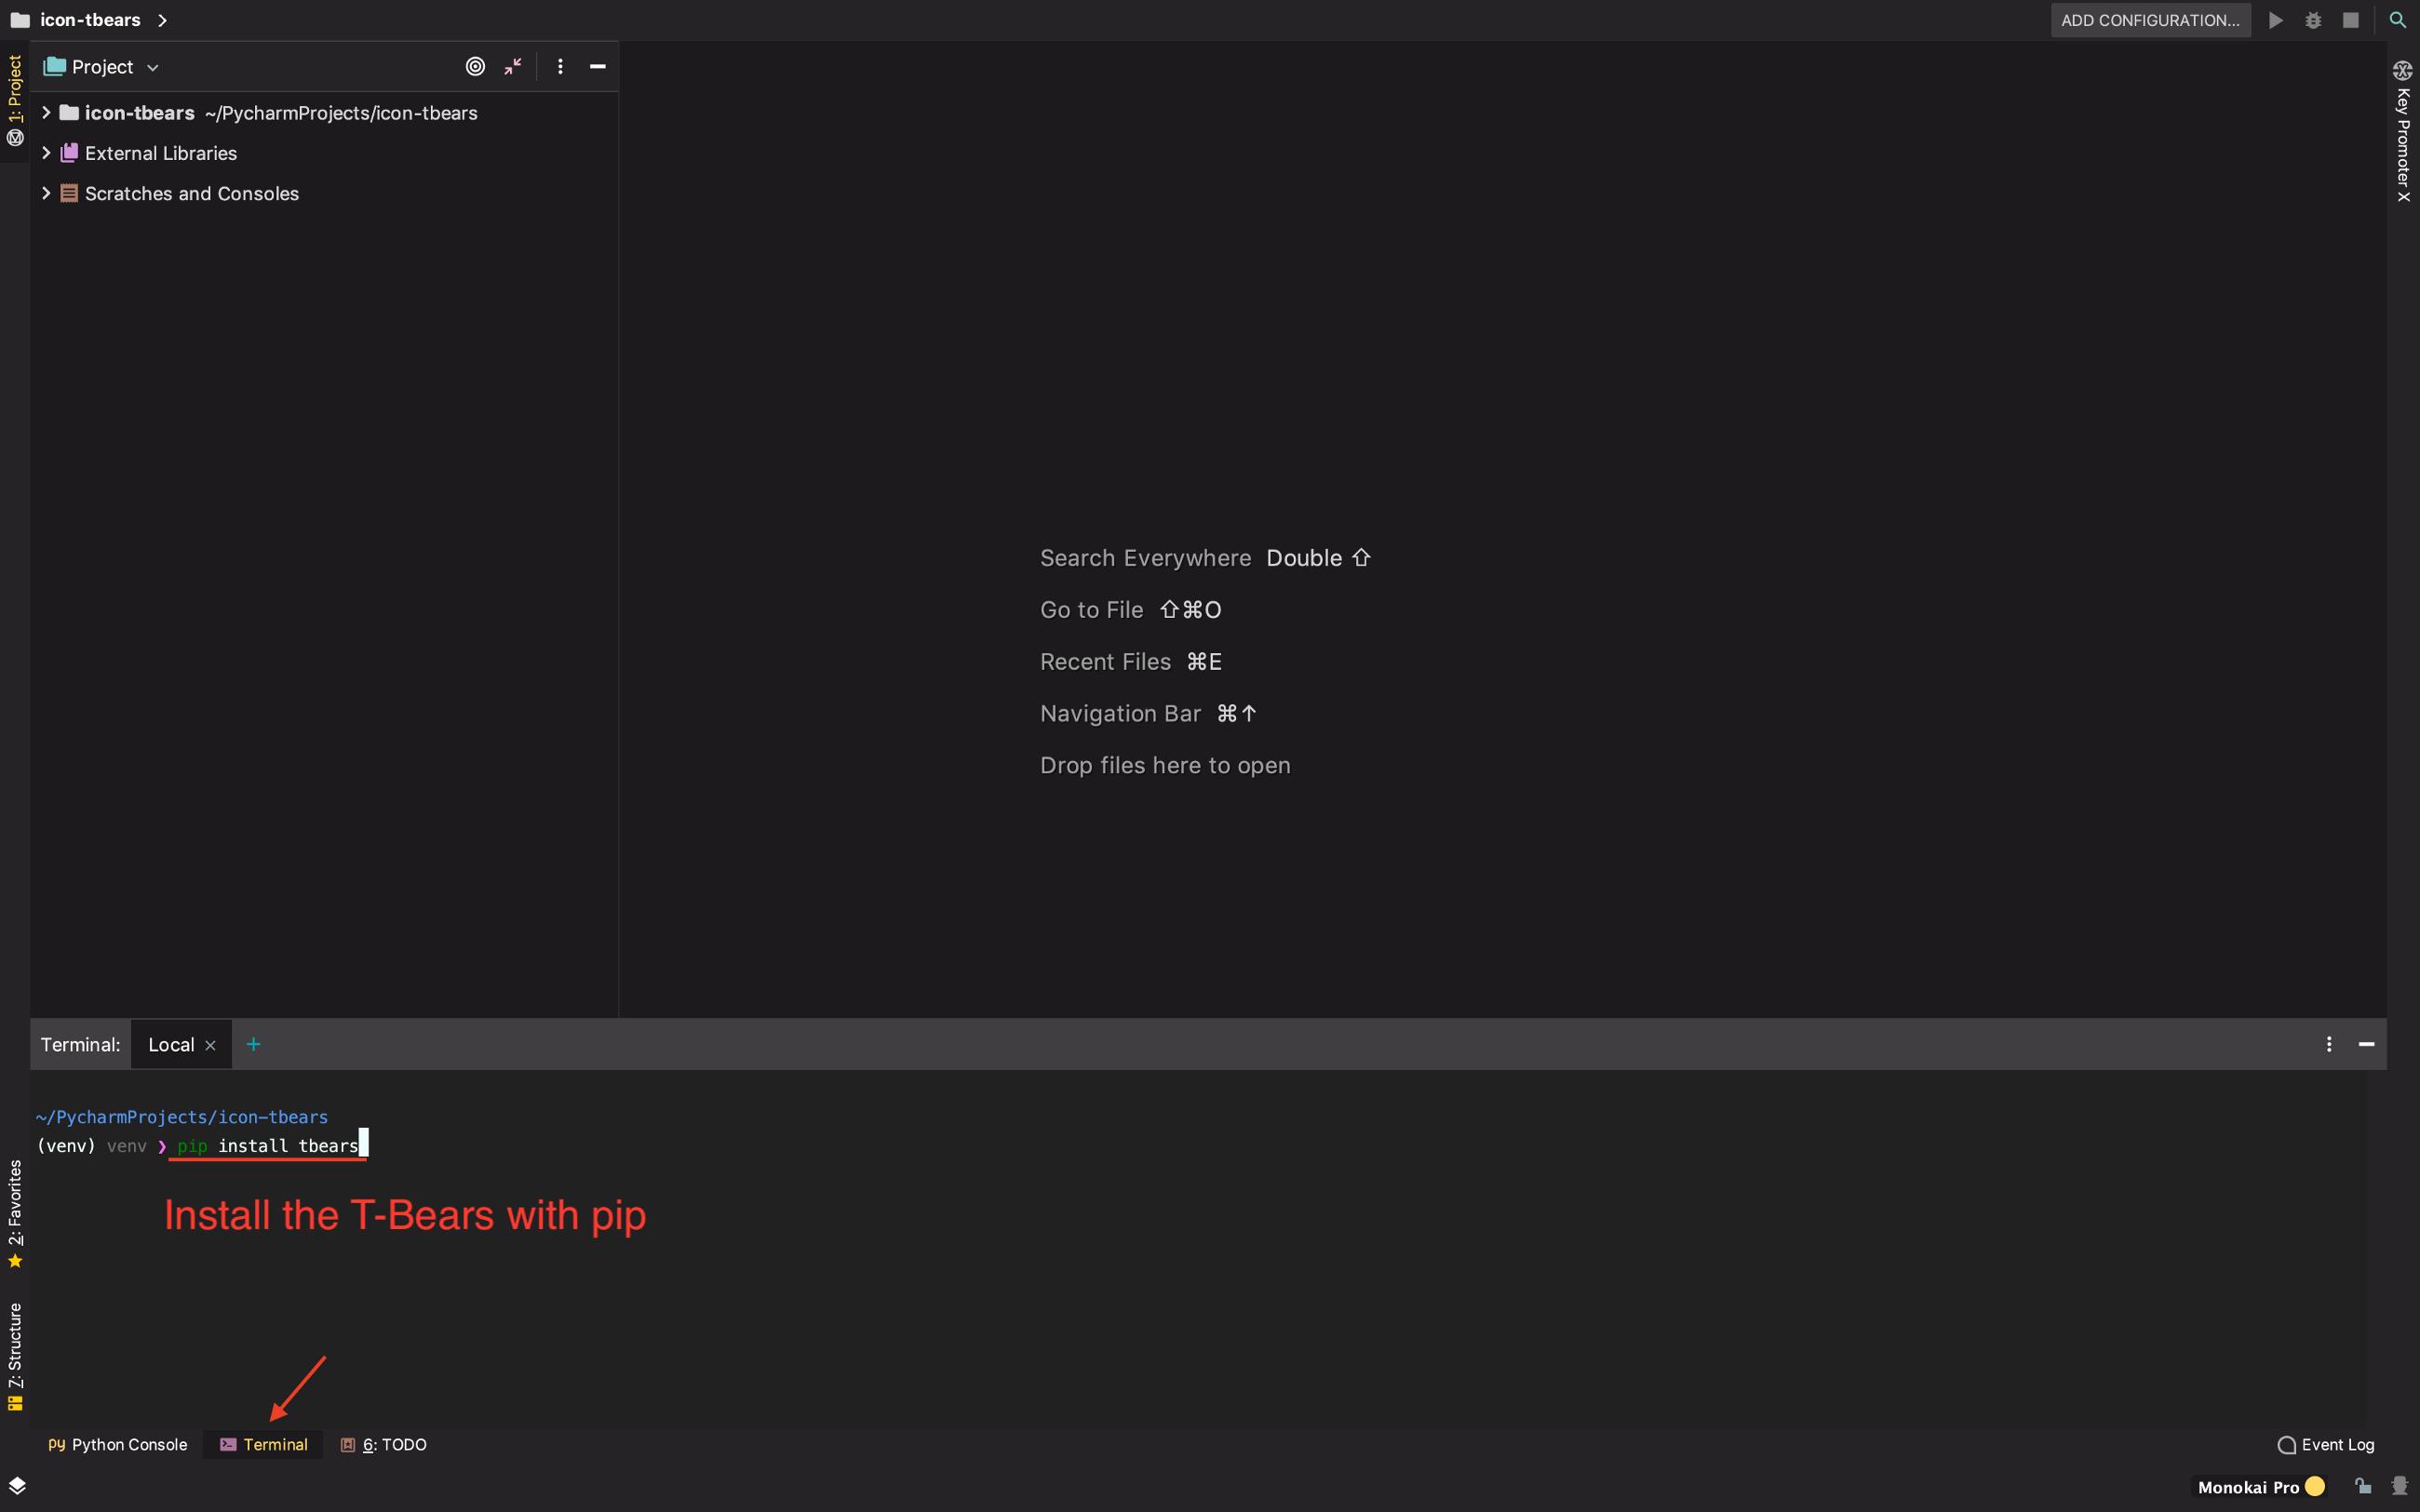 pip install python 3.6 dev